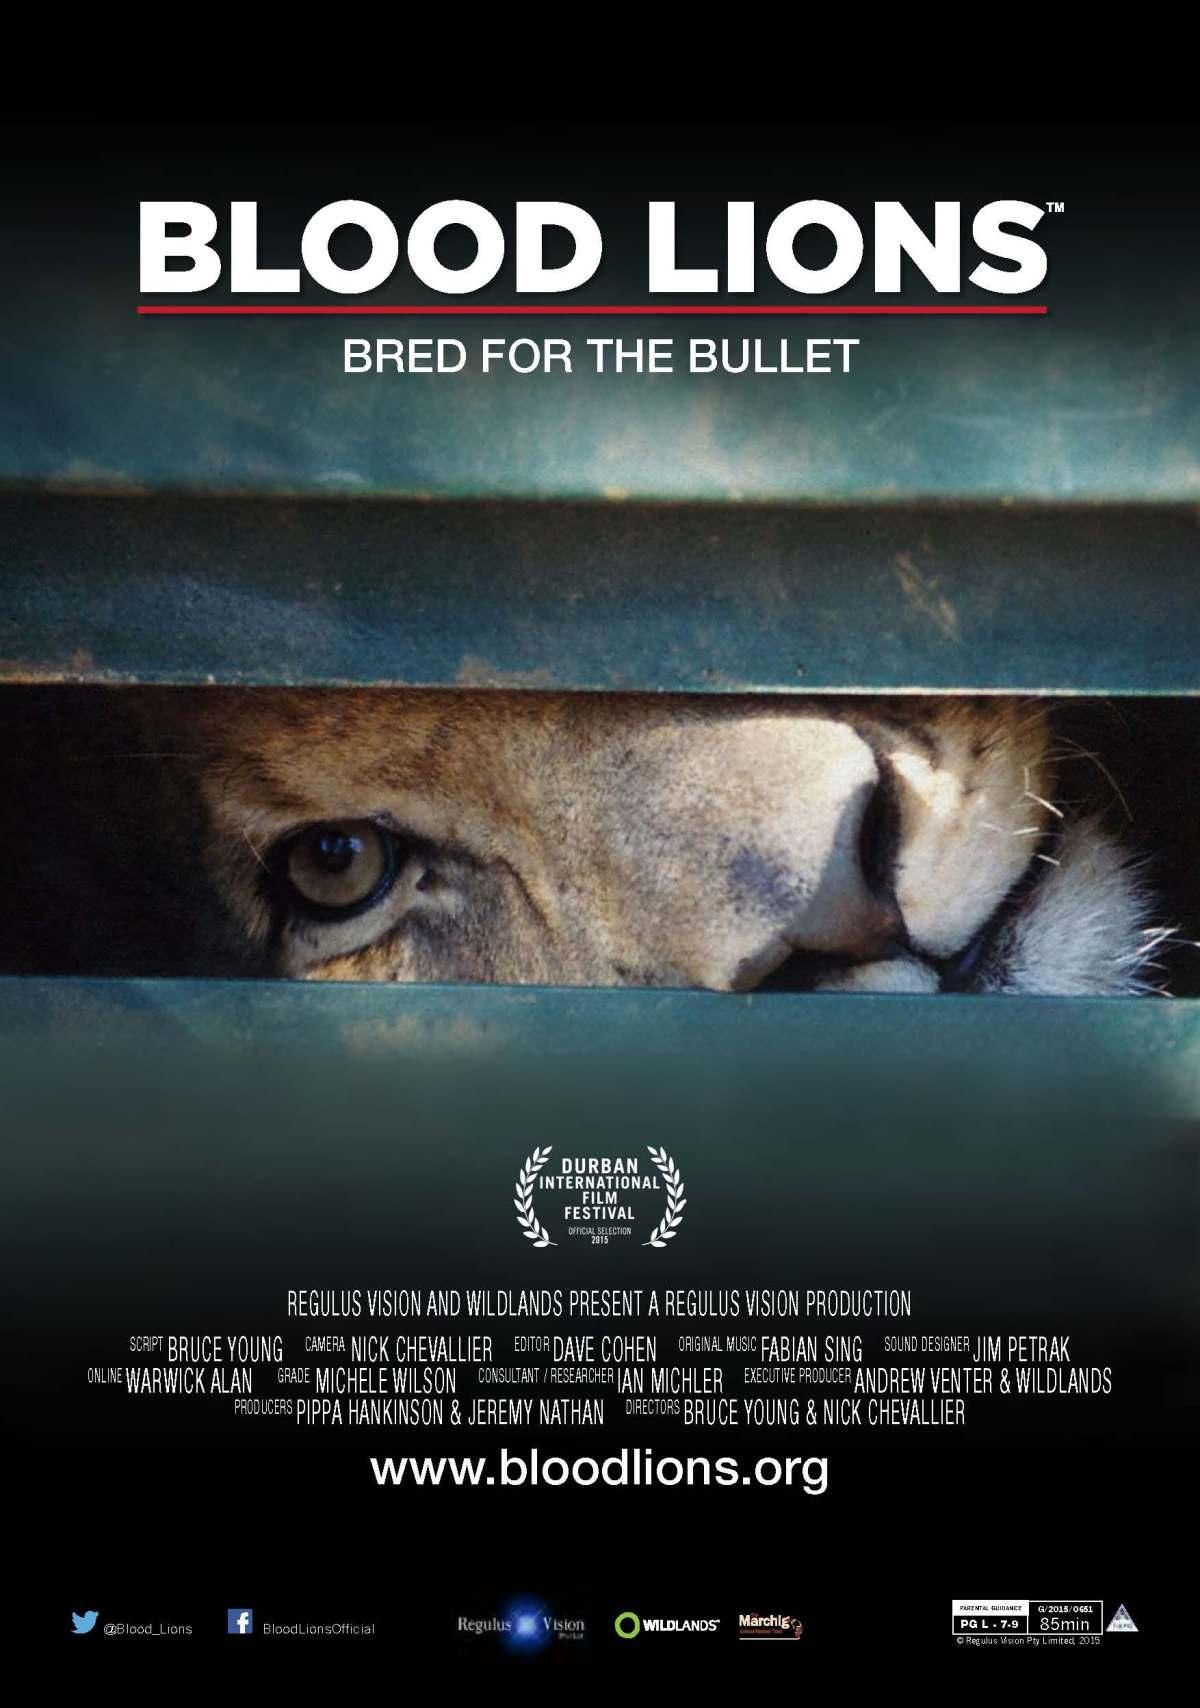 Blood Lions Instagram